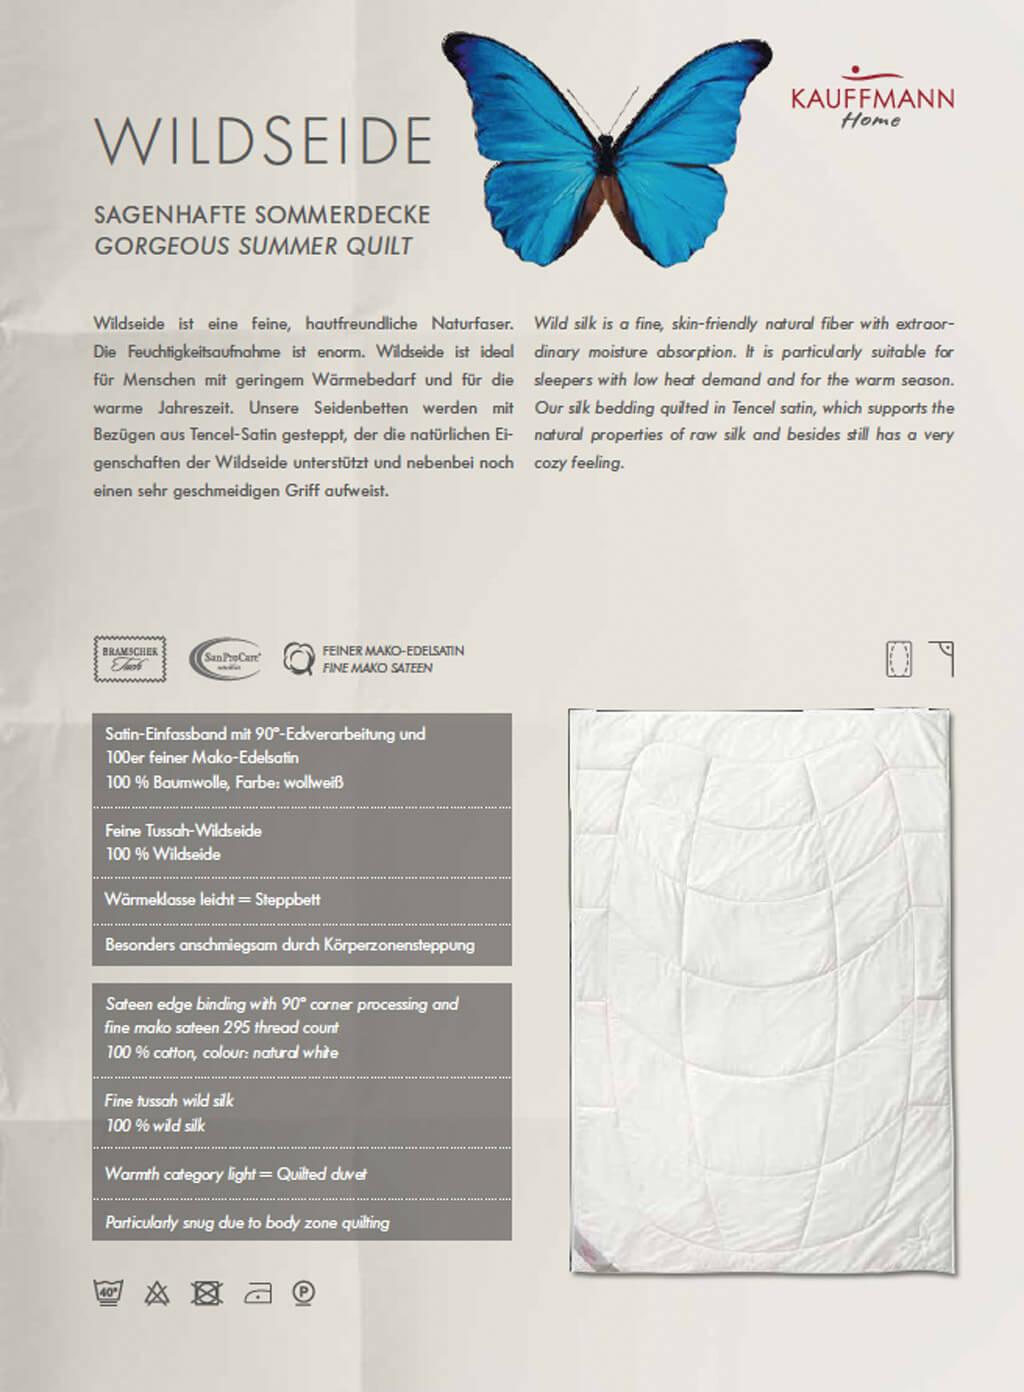 Kauffmann-Wildseidendecke-Produktmerkmale